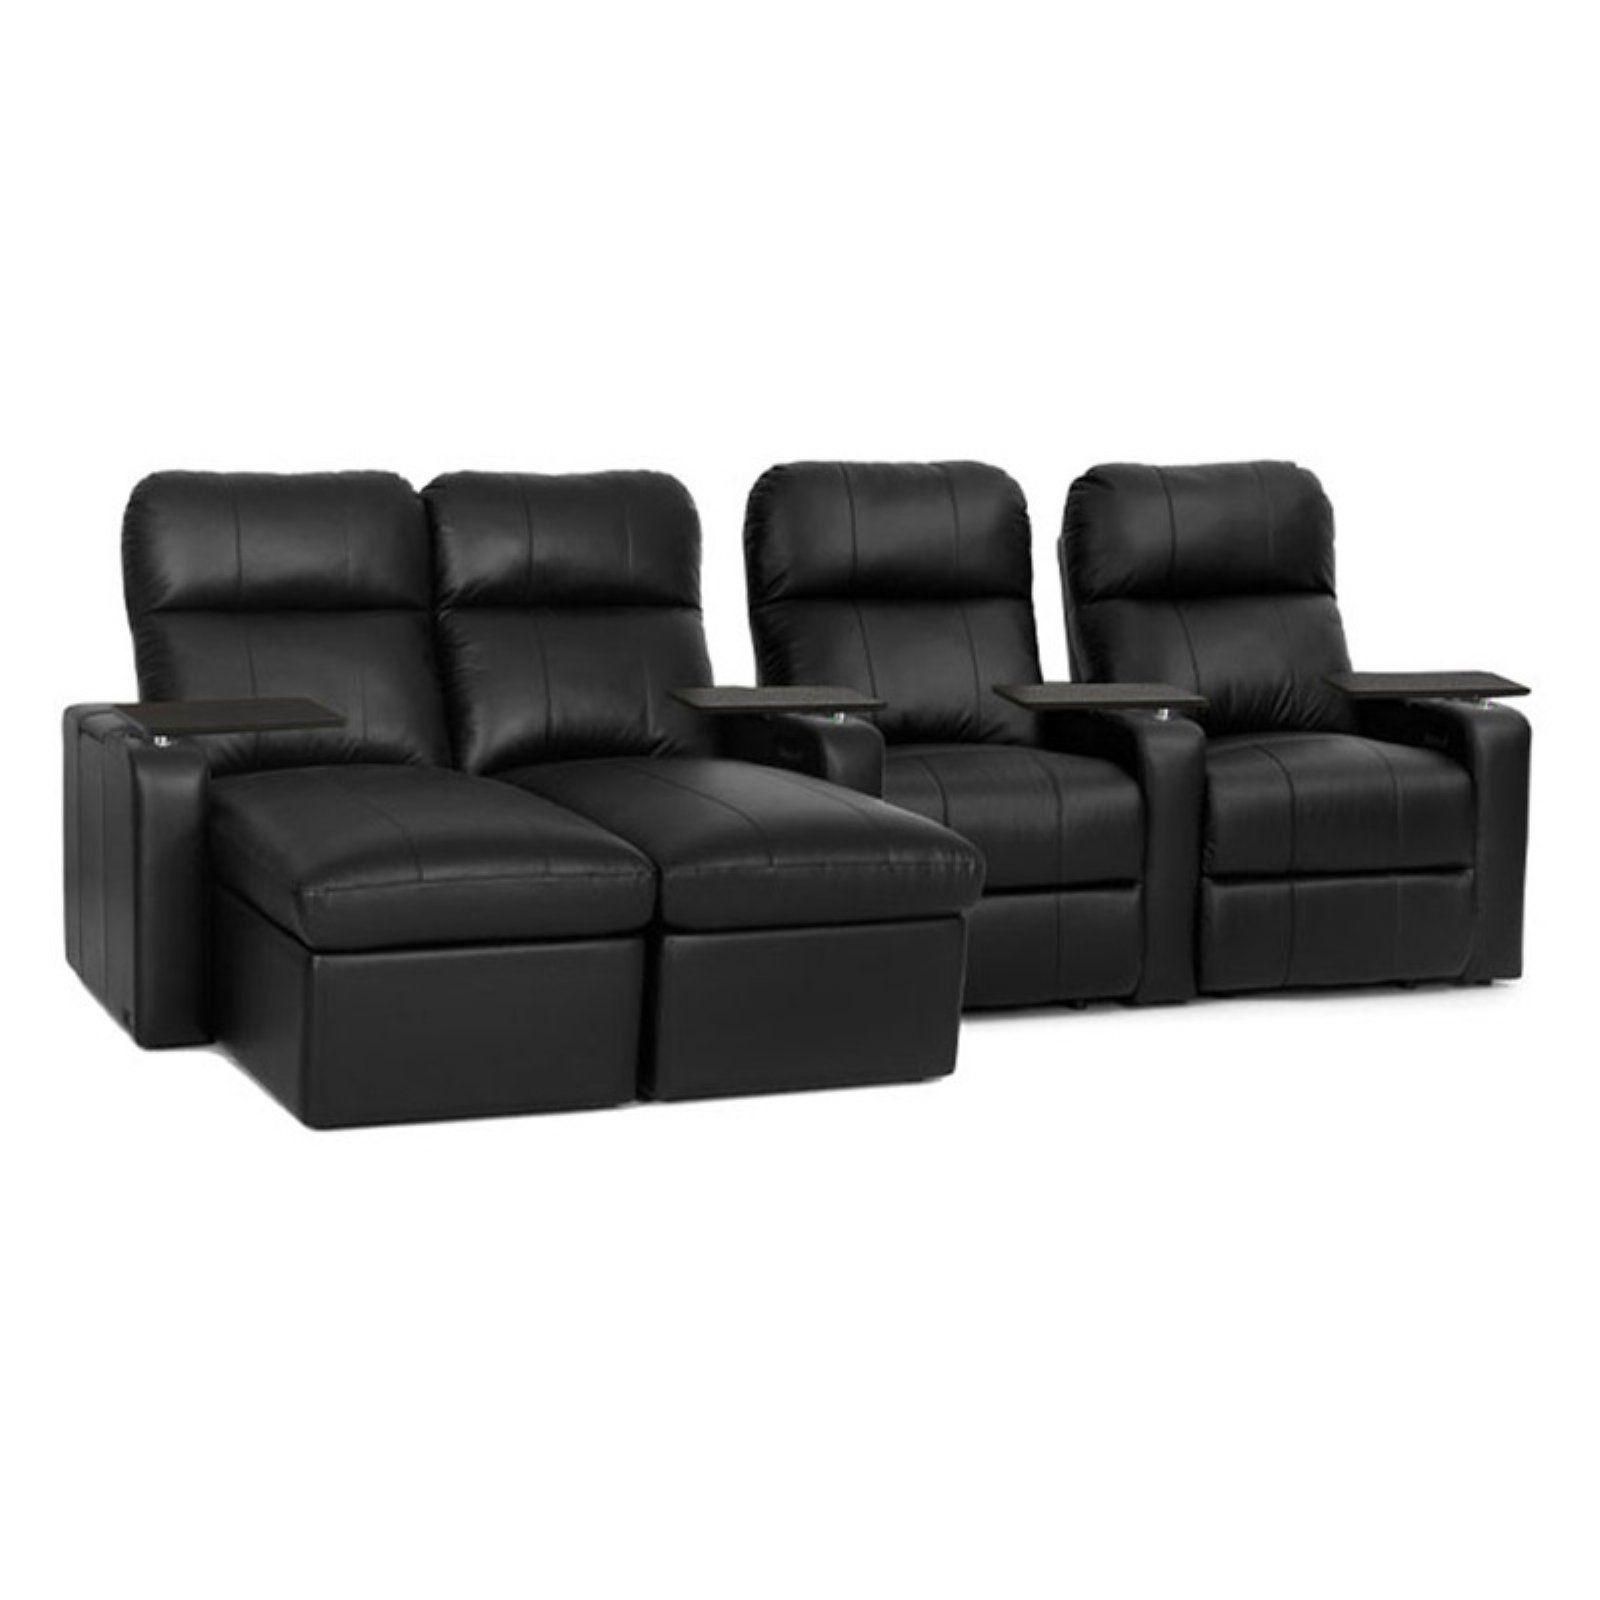 Phenomenal Octane Seating Turbo Xl700 Power Reclining Chaise Lounge Spiritservingveterans Wood Chair Design Ideas Spiritservingveteransorg